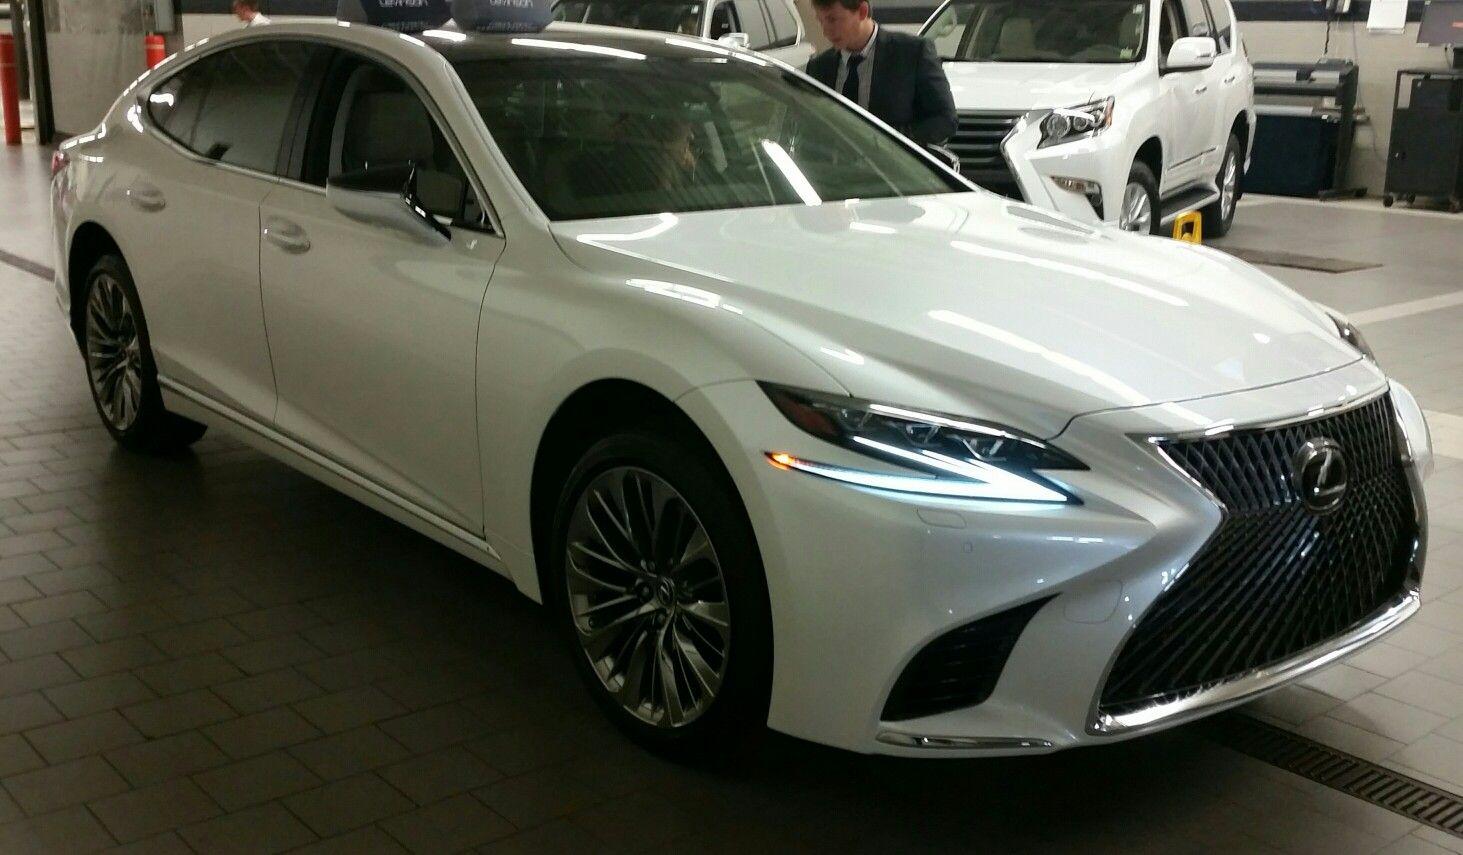 Coming soon 2018 Lexus LS500 Lexus, Sports car, Bmw car